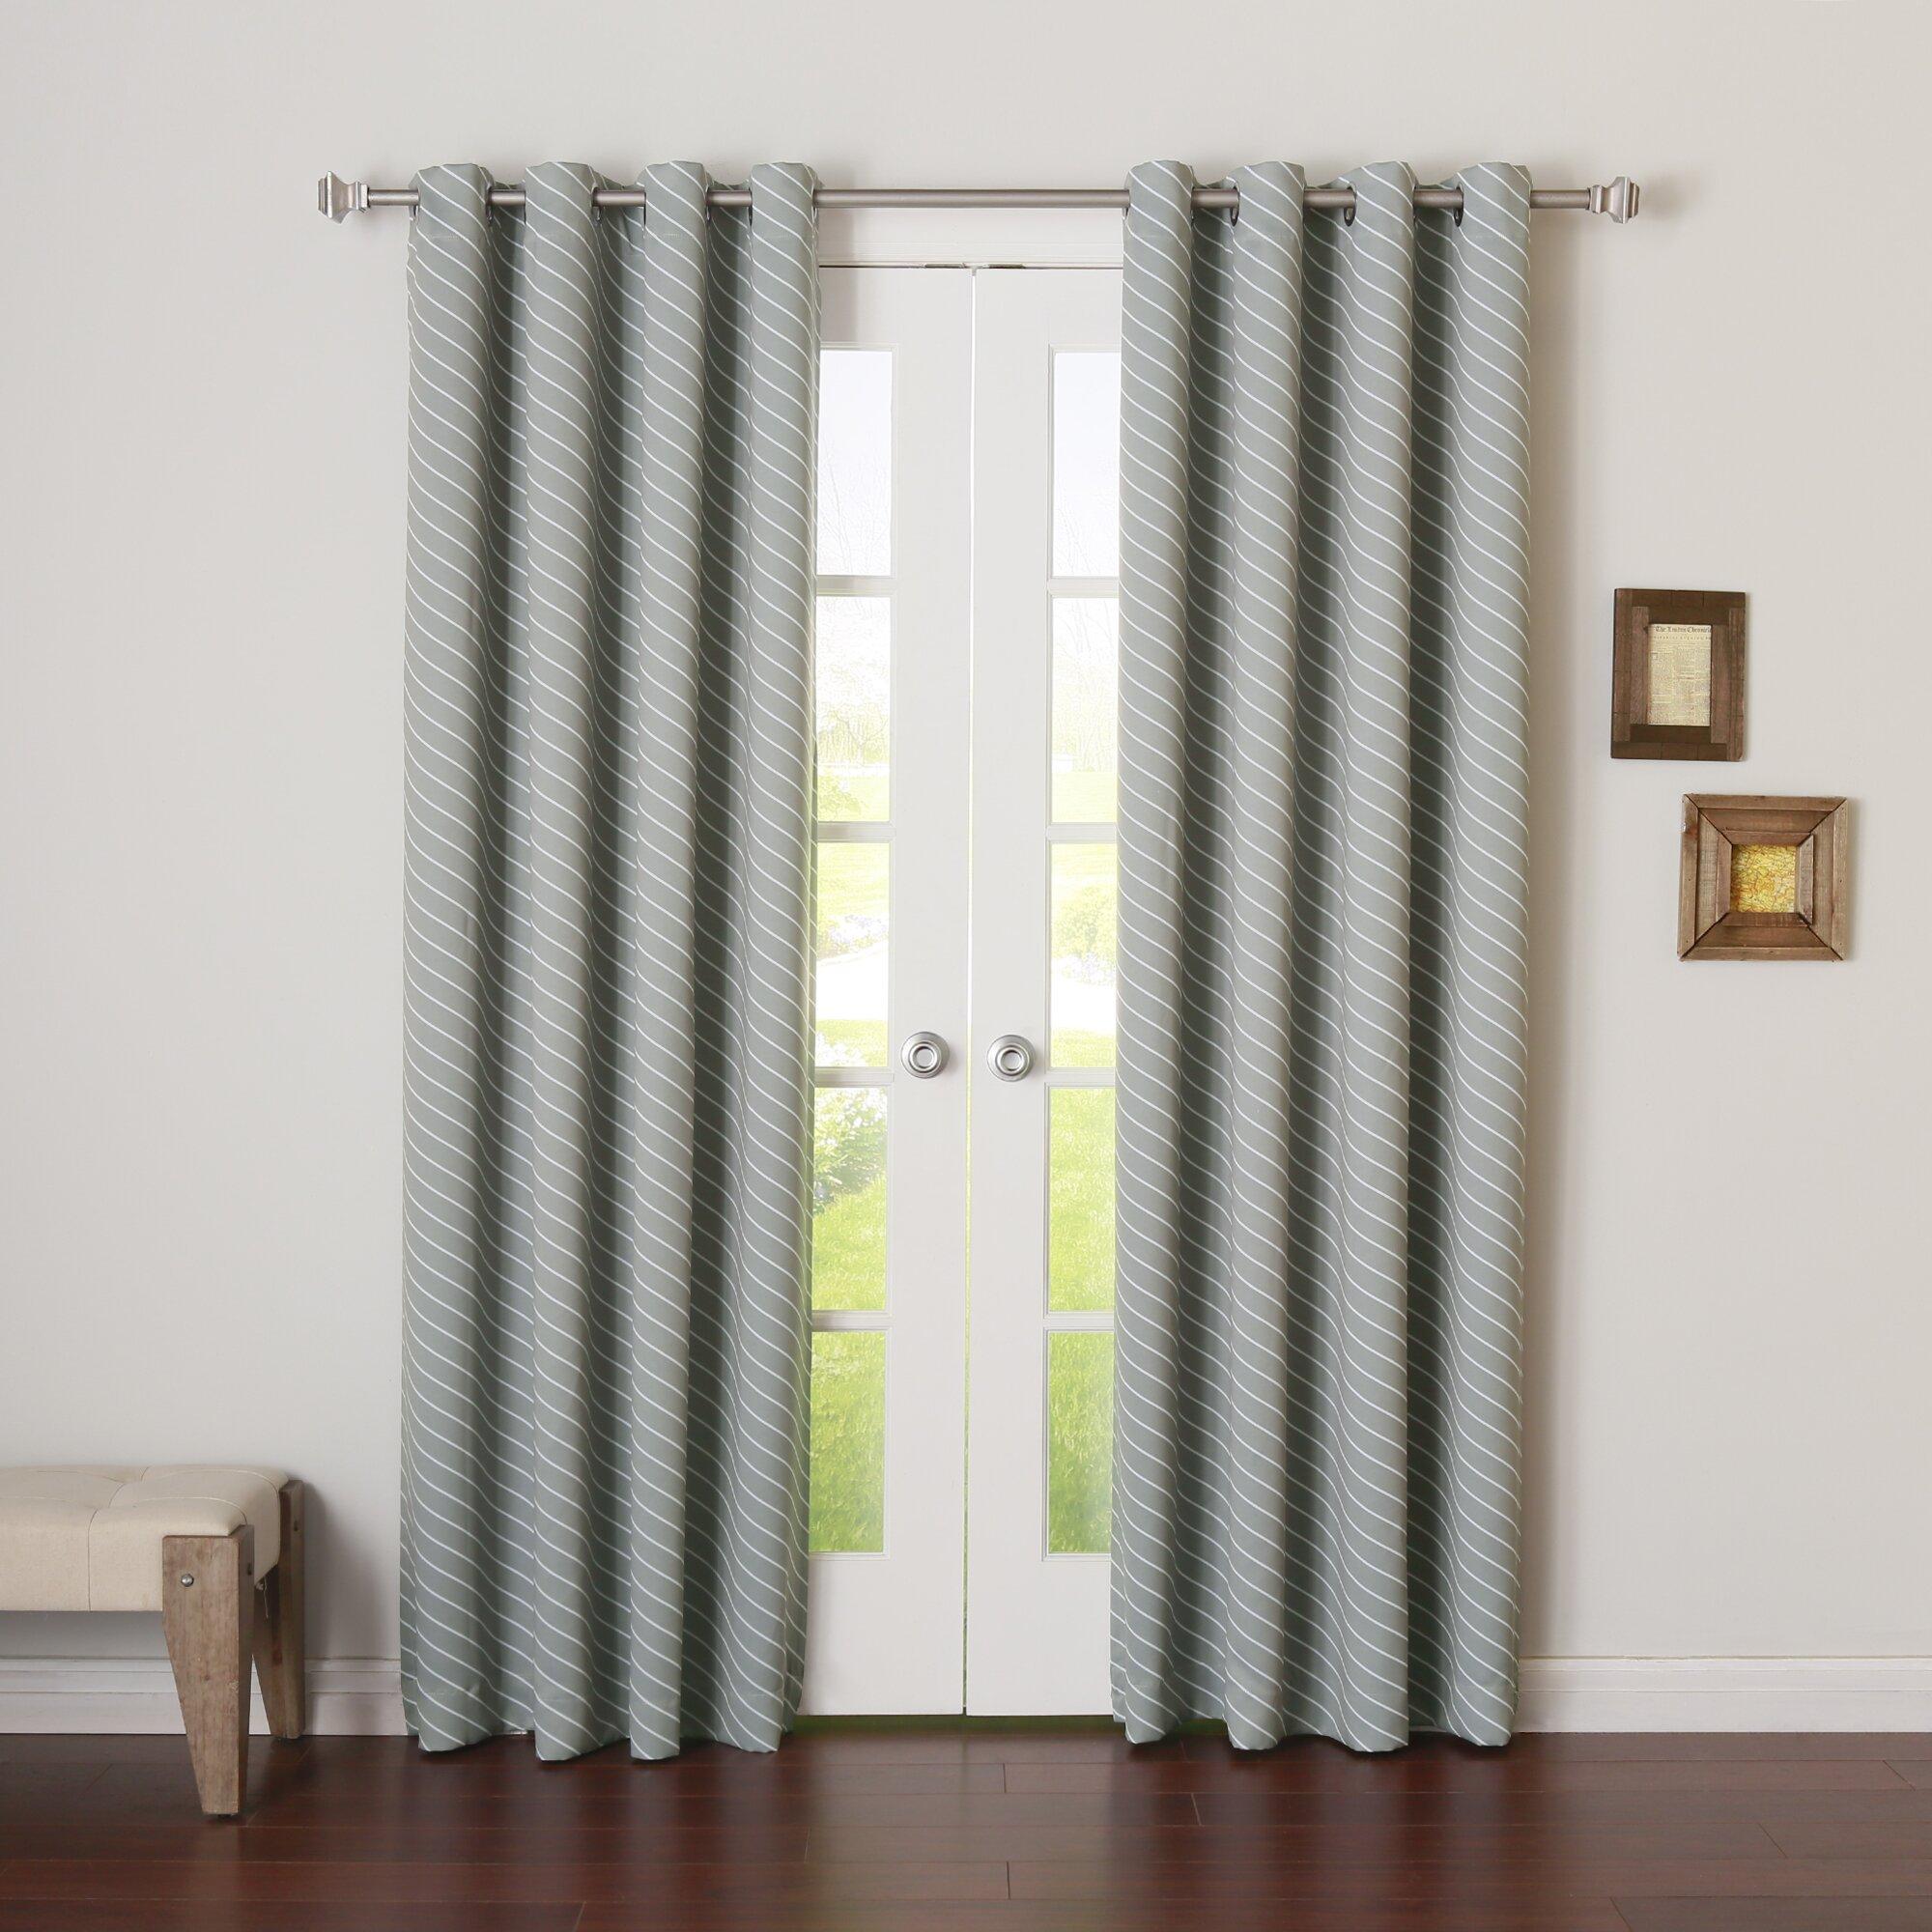 Best Home Fashion Inc Diagonal Stripe Room Darkening Curtain Panels Wayfair